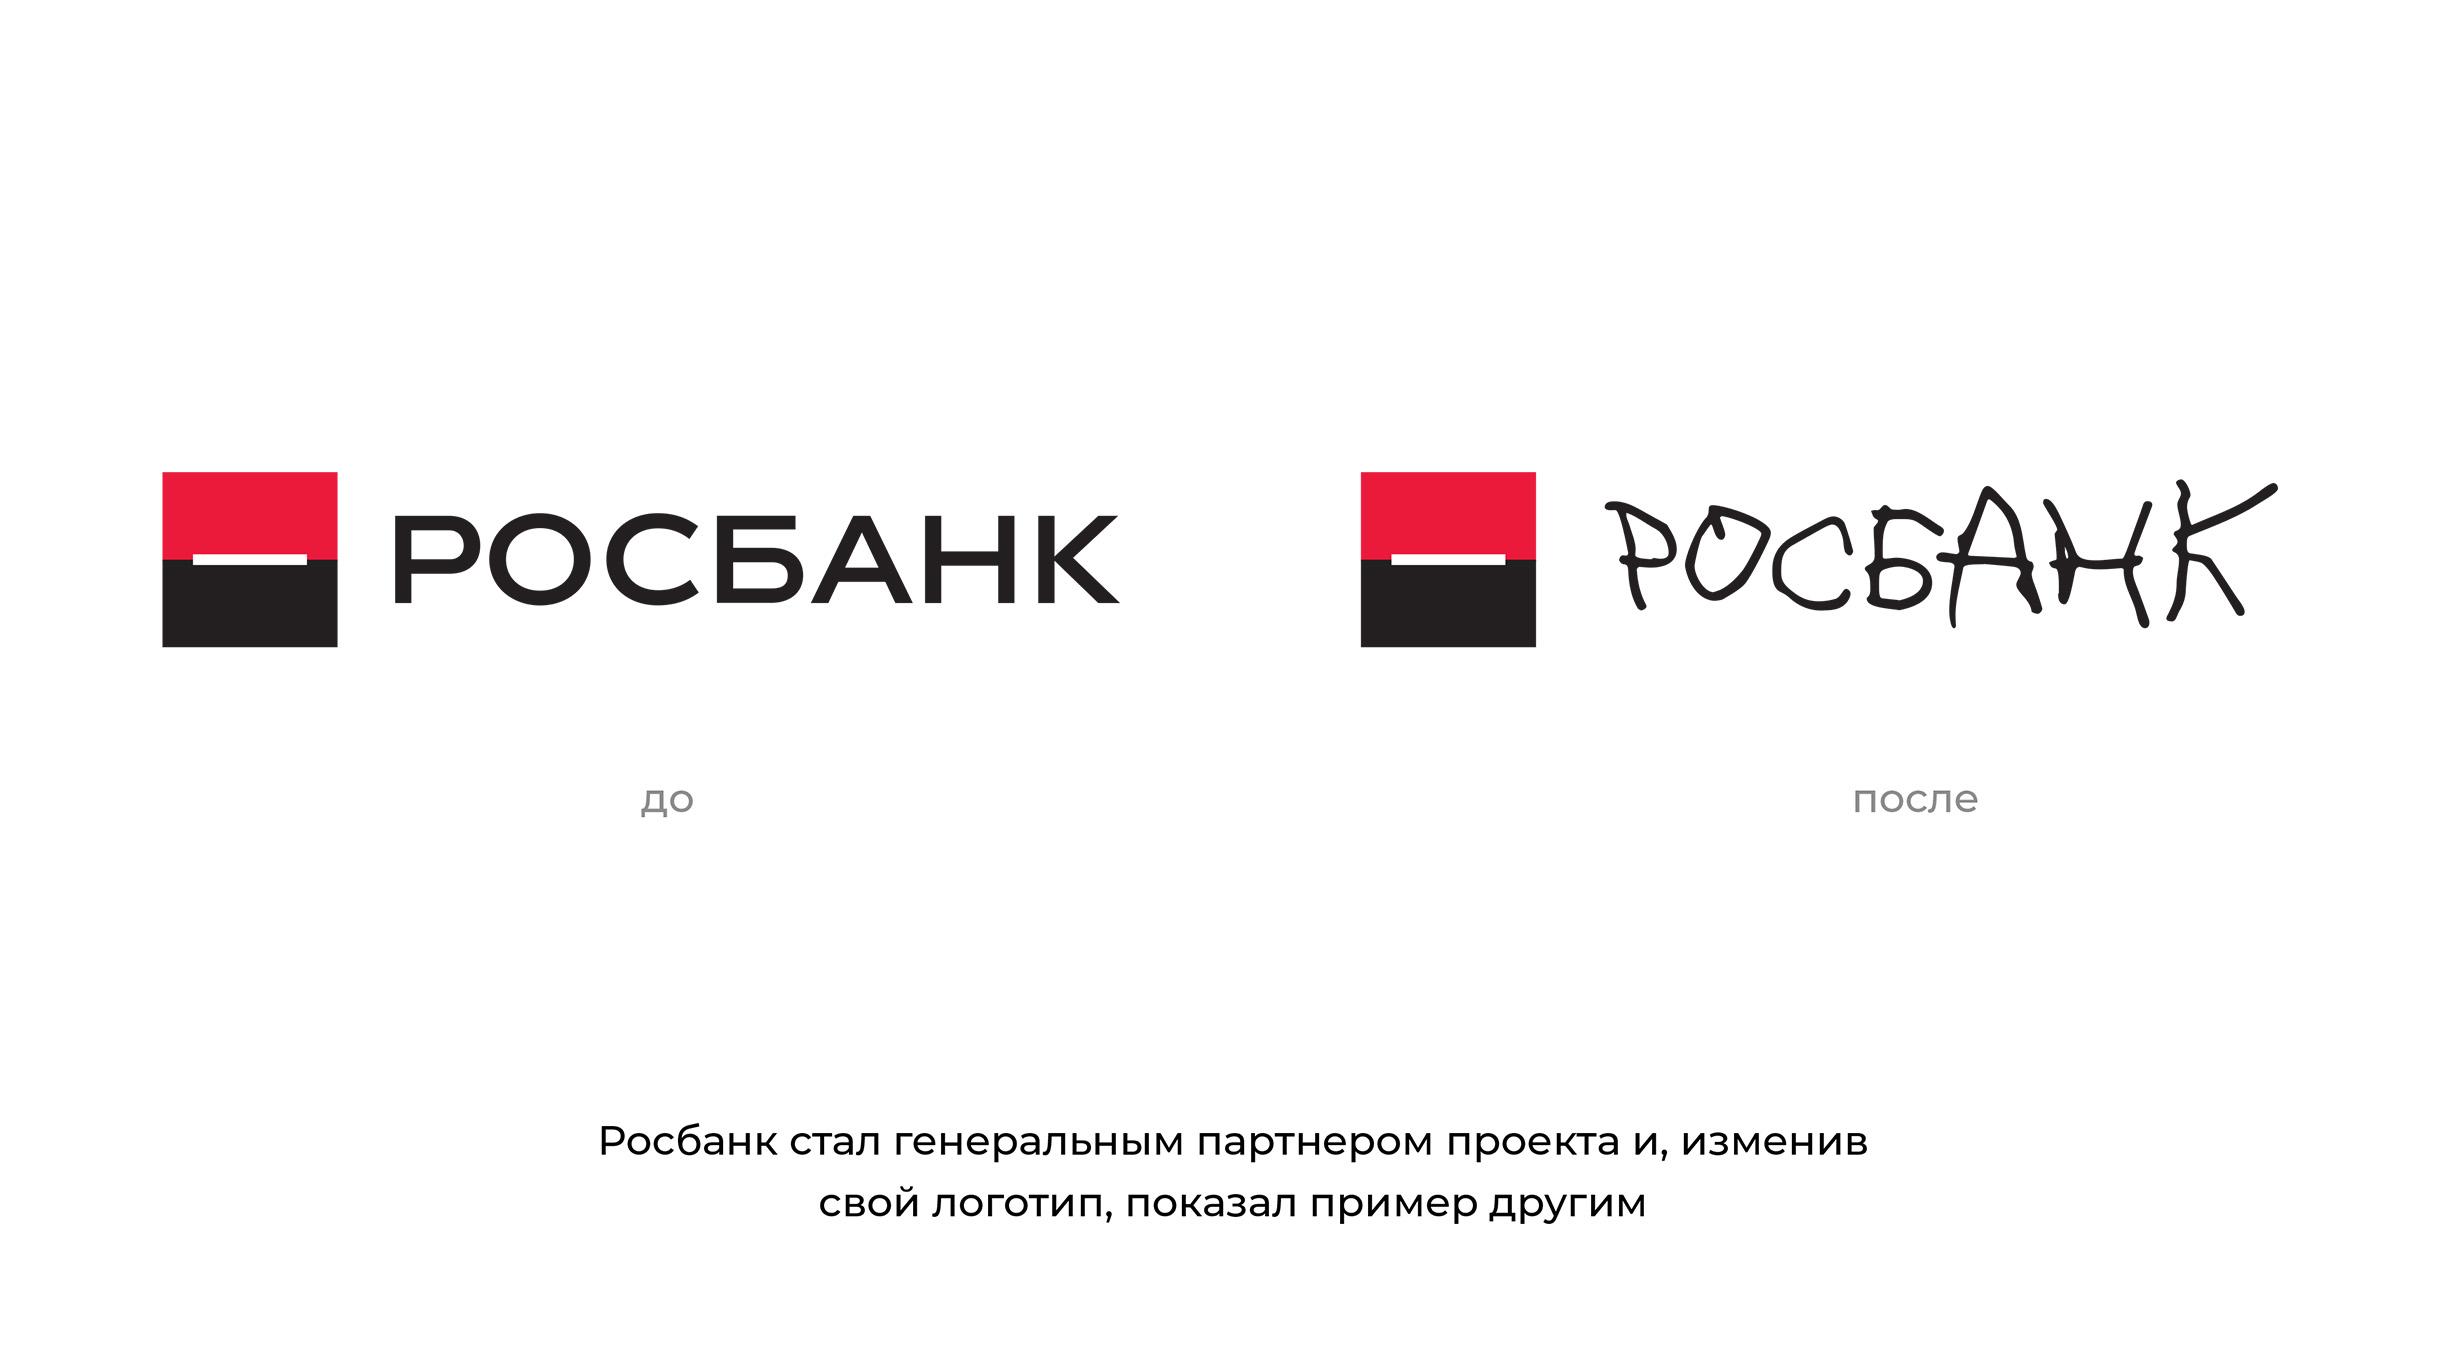 FOK_RUS-8